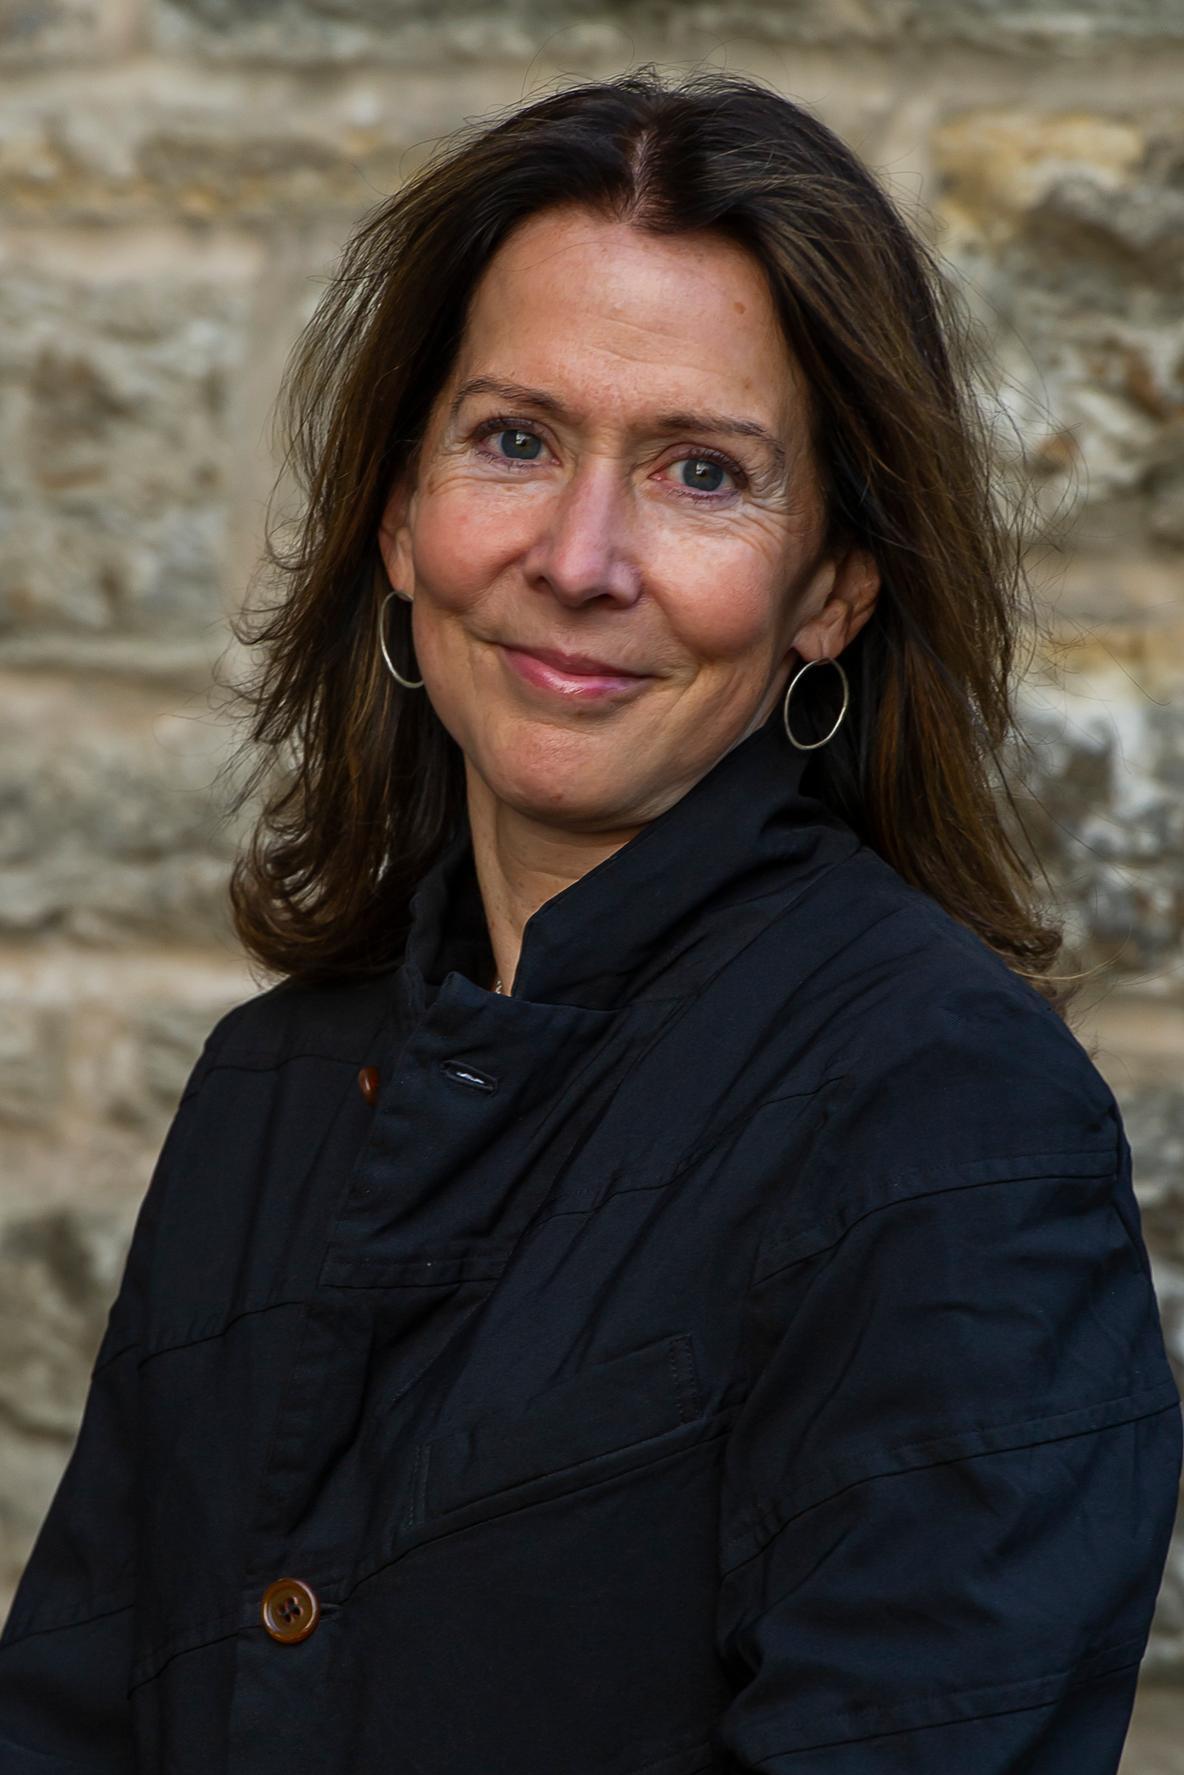 Jenele Grassle